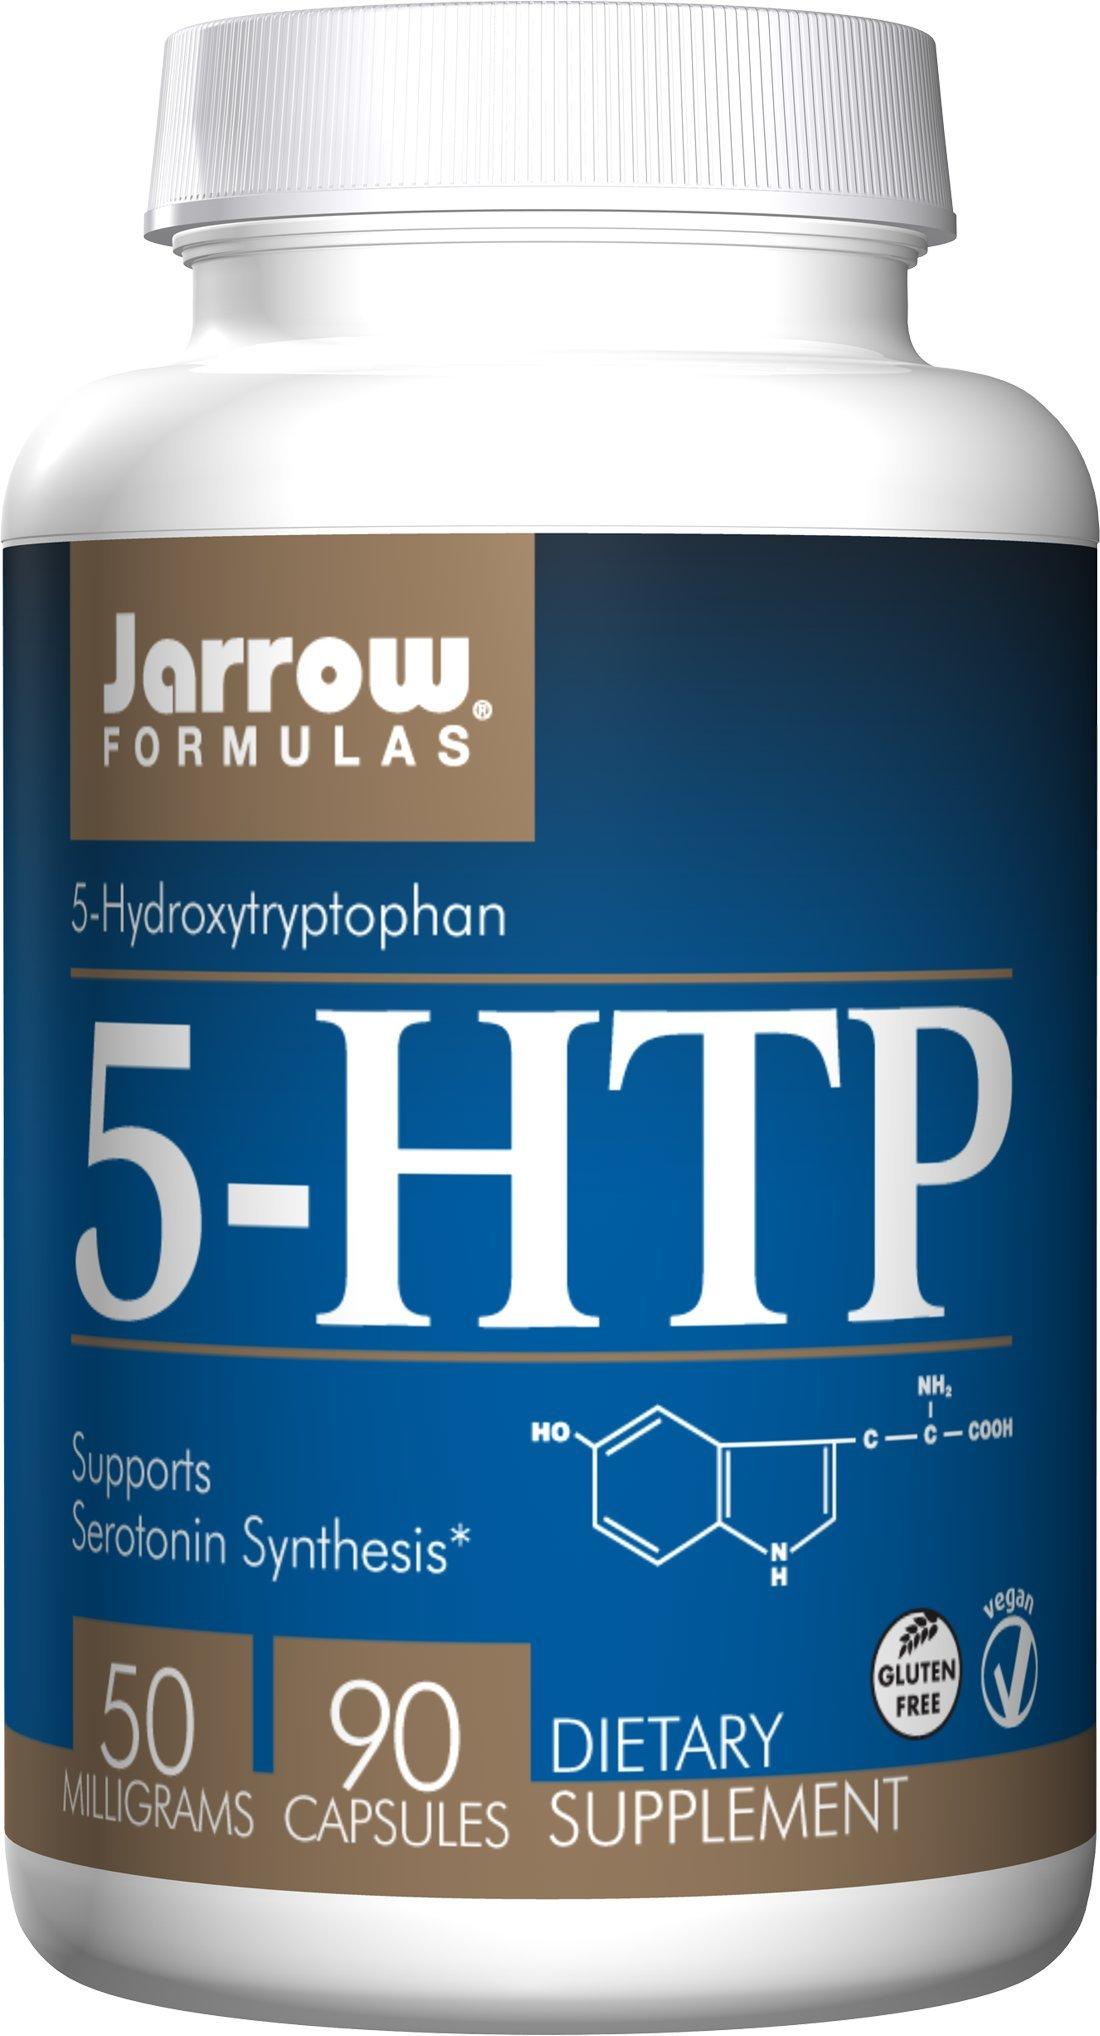 Jarrow Formulas 5-HTP 50mg, Brain and Memory Support, 90 Caps